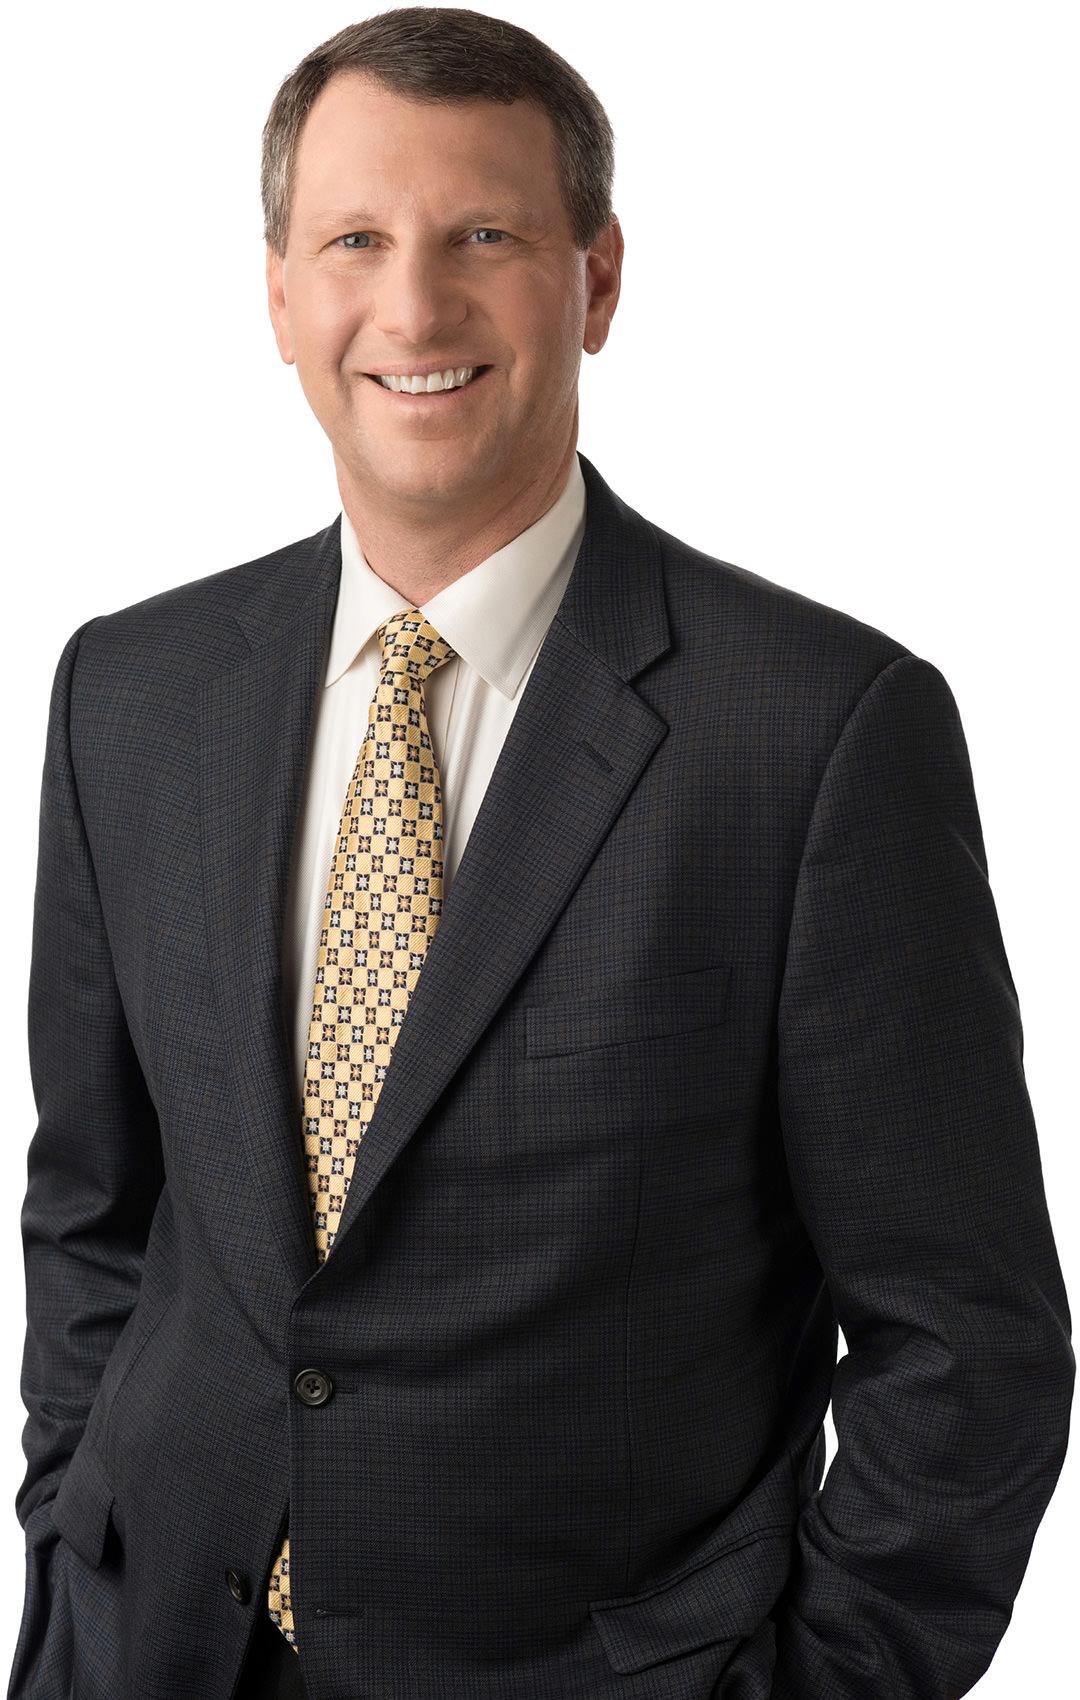 Christopher J. Blake